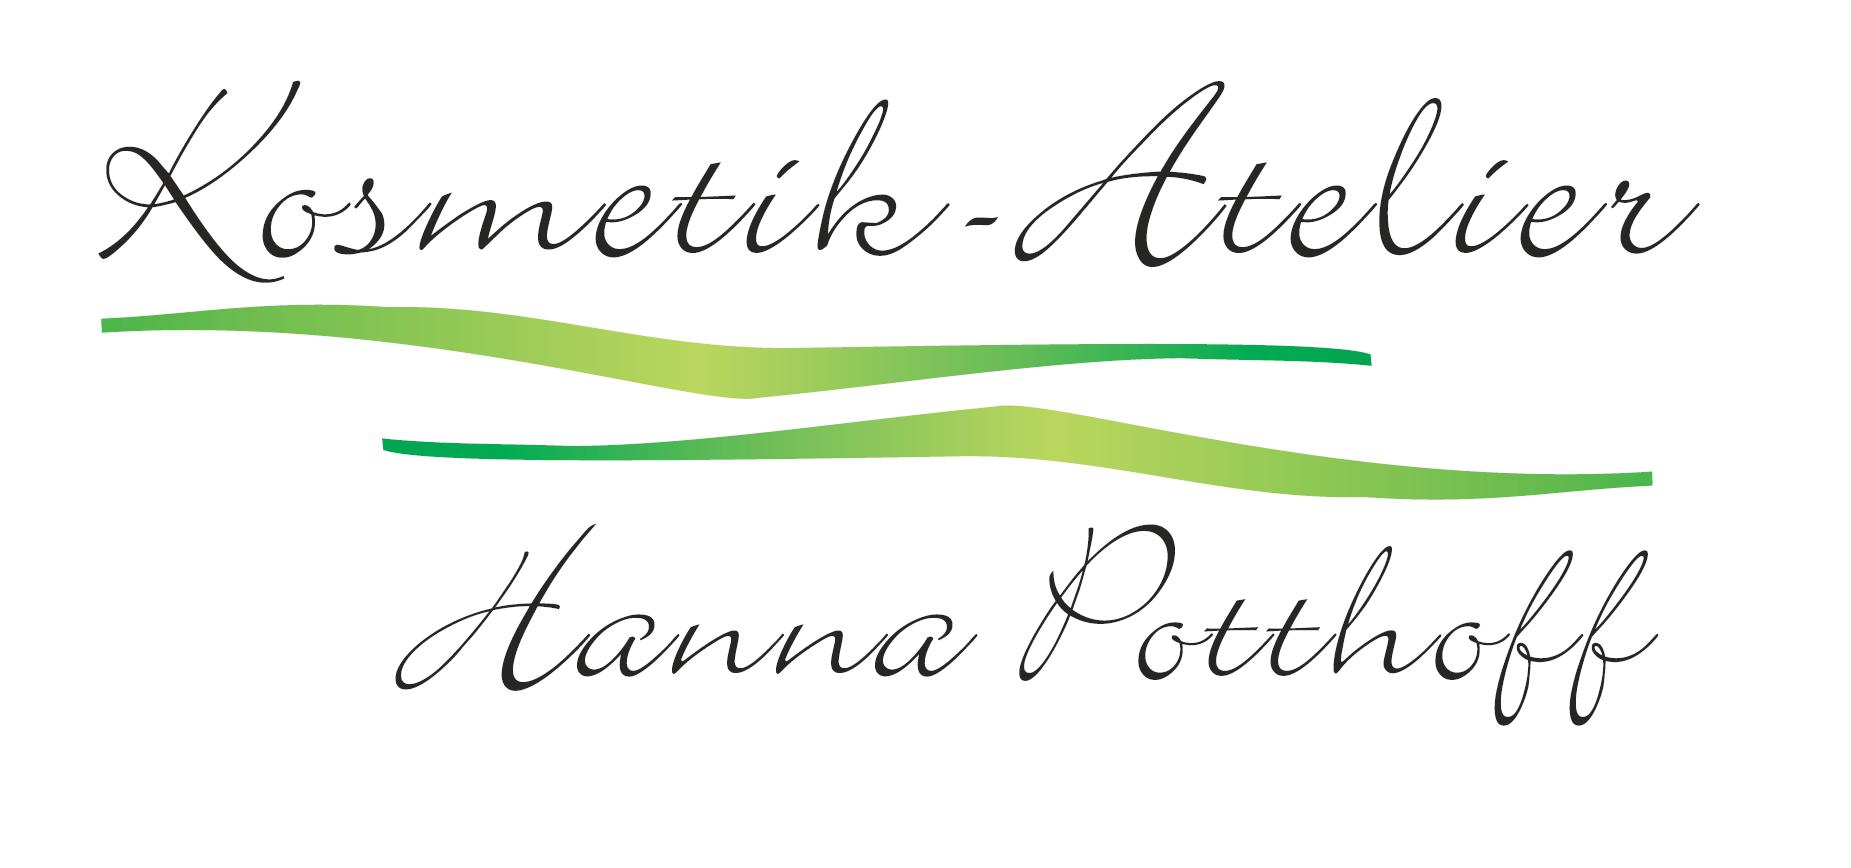 Kosmetik - Atelier Hanna Potthoff - Kosmetik-